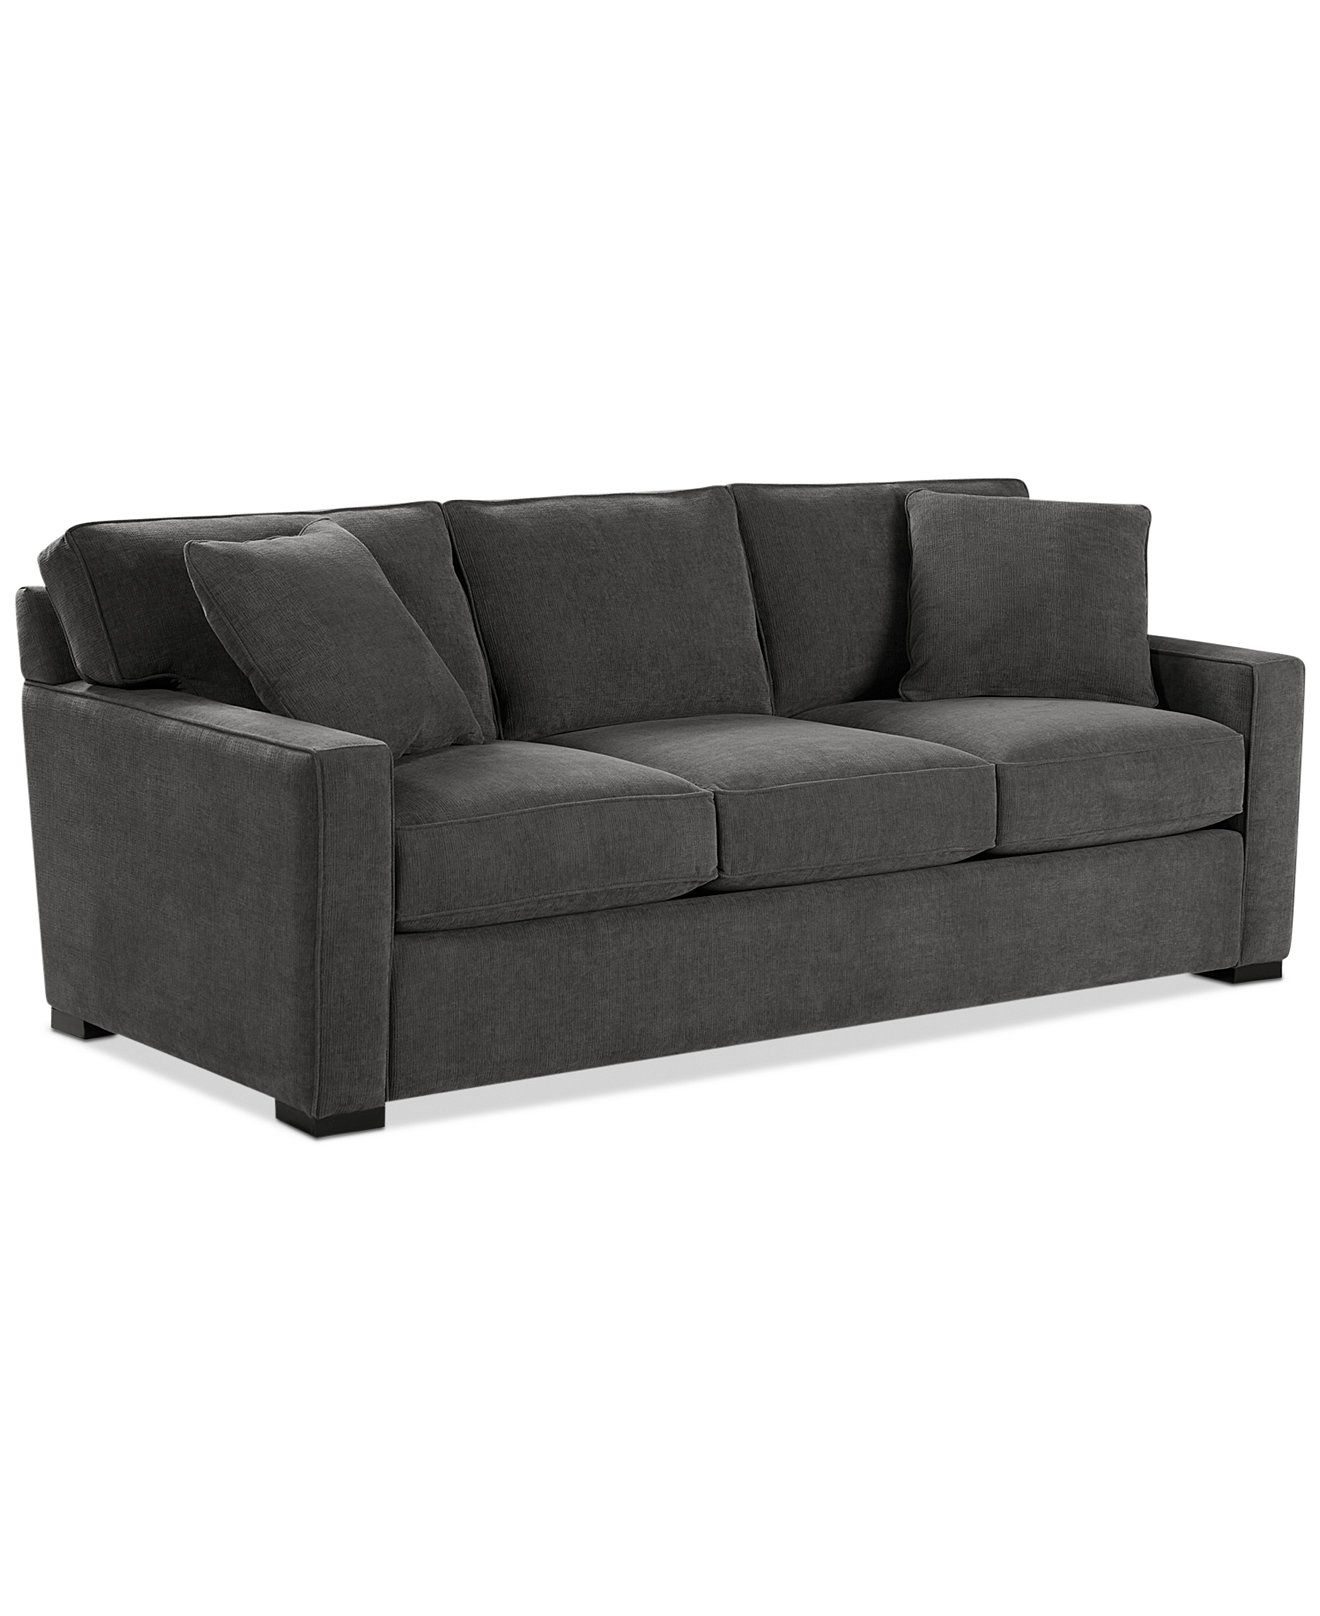 Awesome Macys Sleeper Sofa Amazing 27 For Rh Pinterest Com